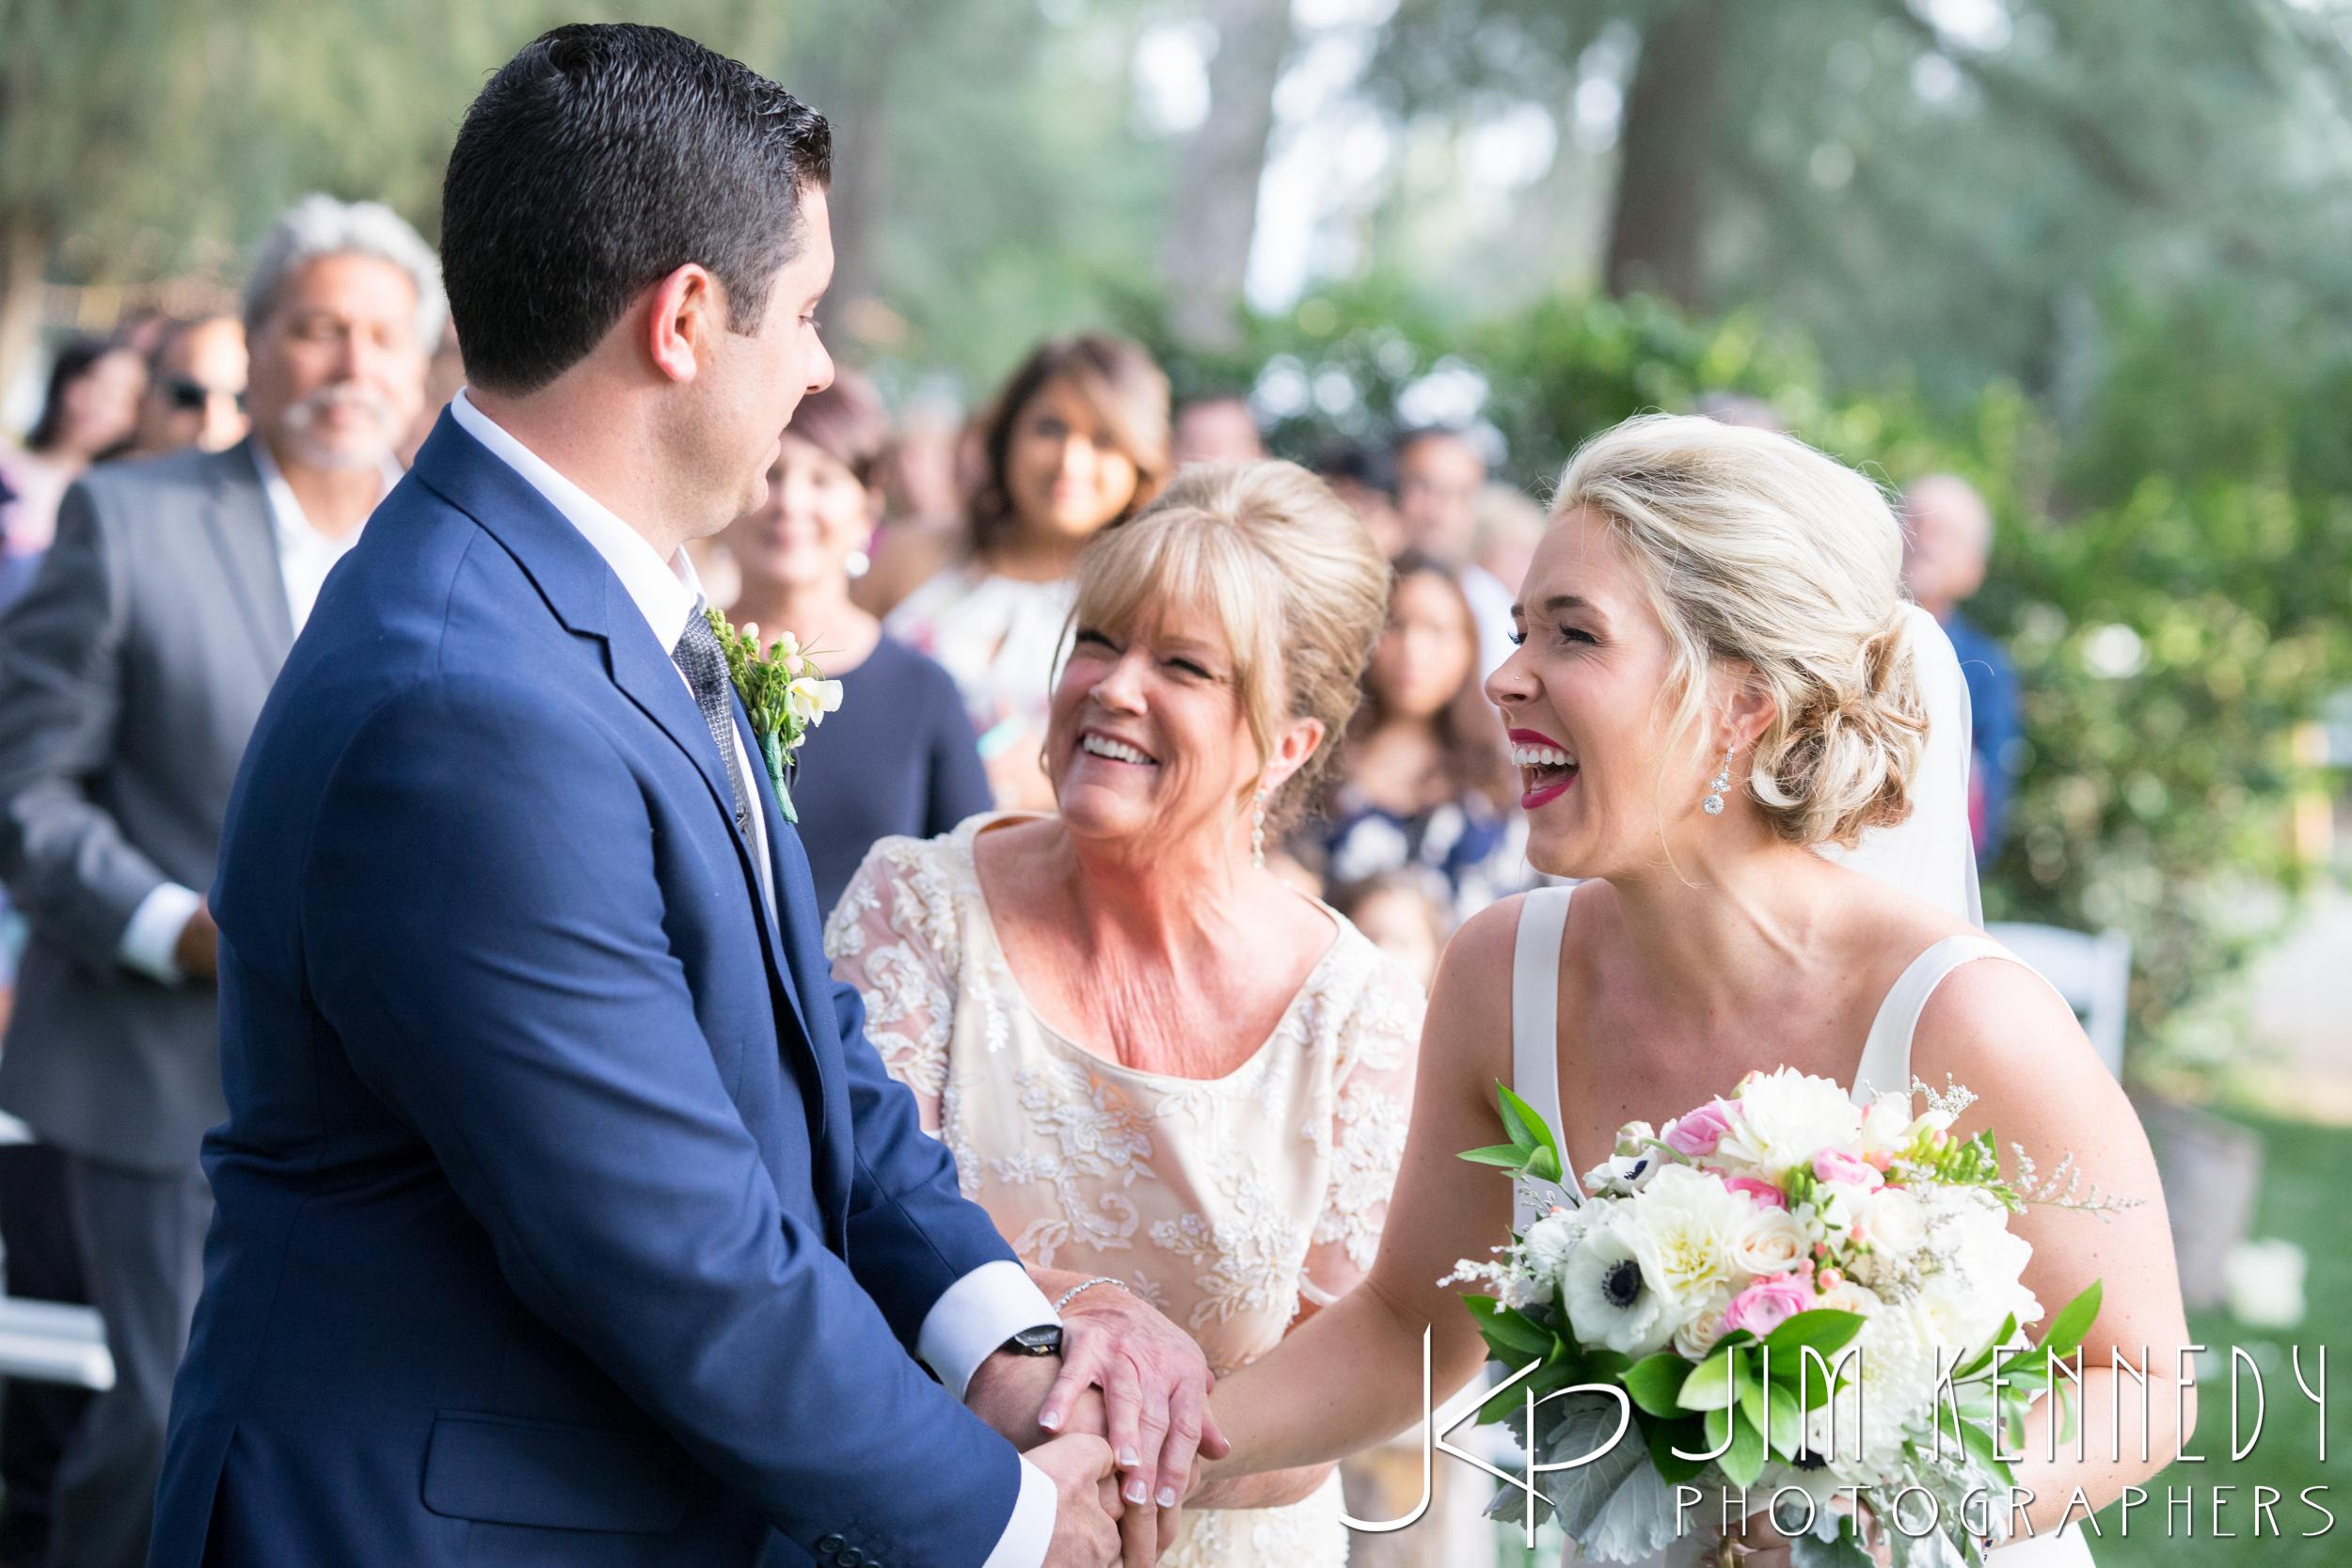 jim_kennedy_photographers_highland_springs_wedding_caitlyn_0105.jpg